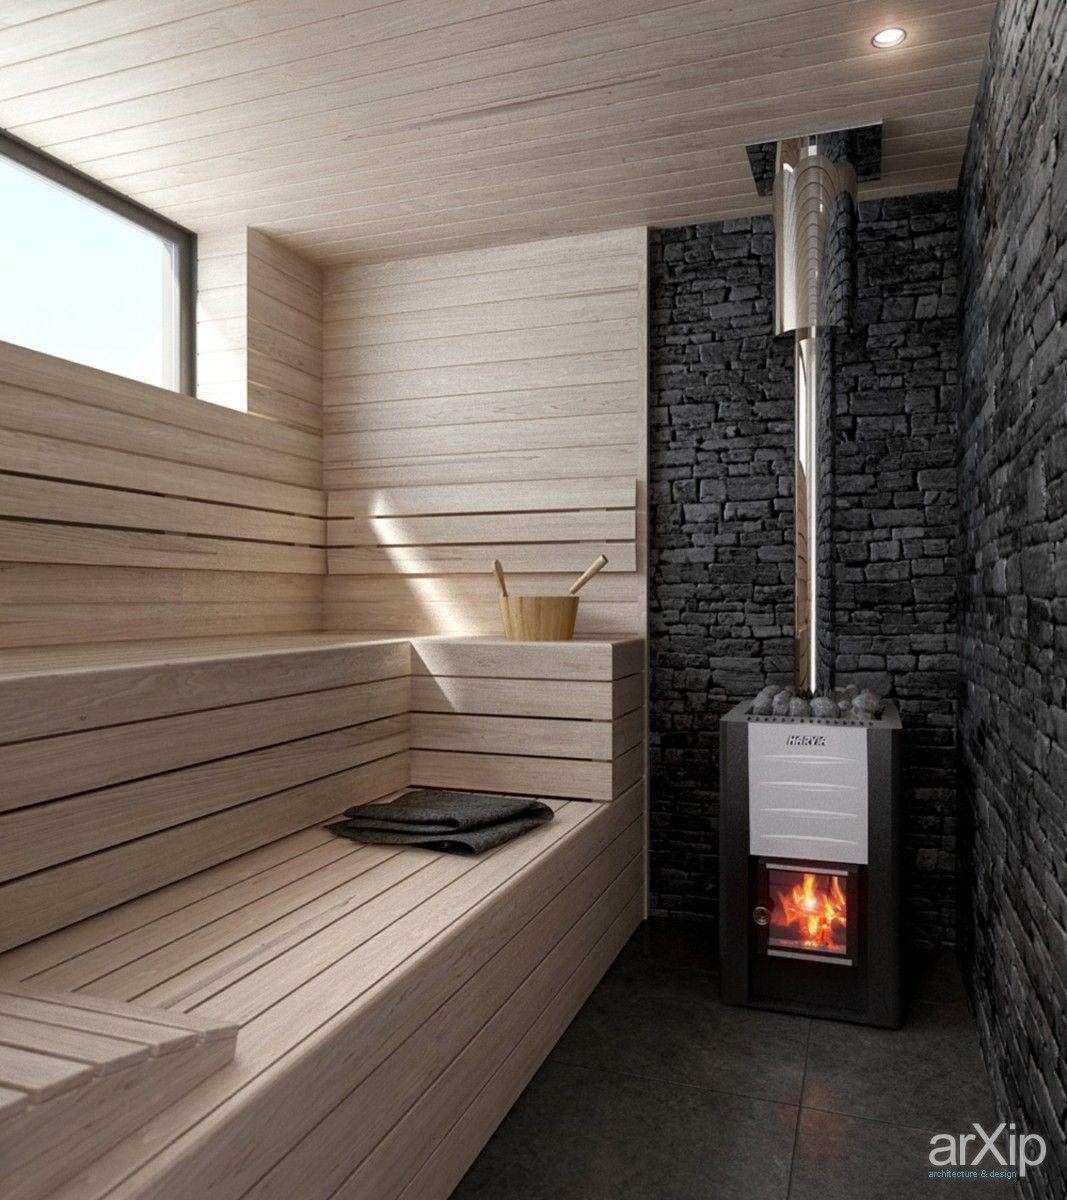 House AUS (парная+моечная) интерьер, назначение - квартира, дом   тип - баня, сауна, хамам   площадь - 10 - 20 м2   стиль - минимализм. Разместил INT2architecture на портале arXip.com